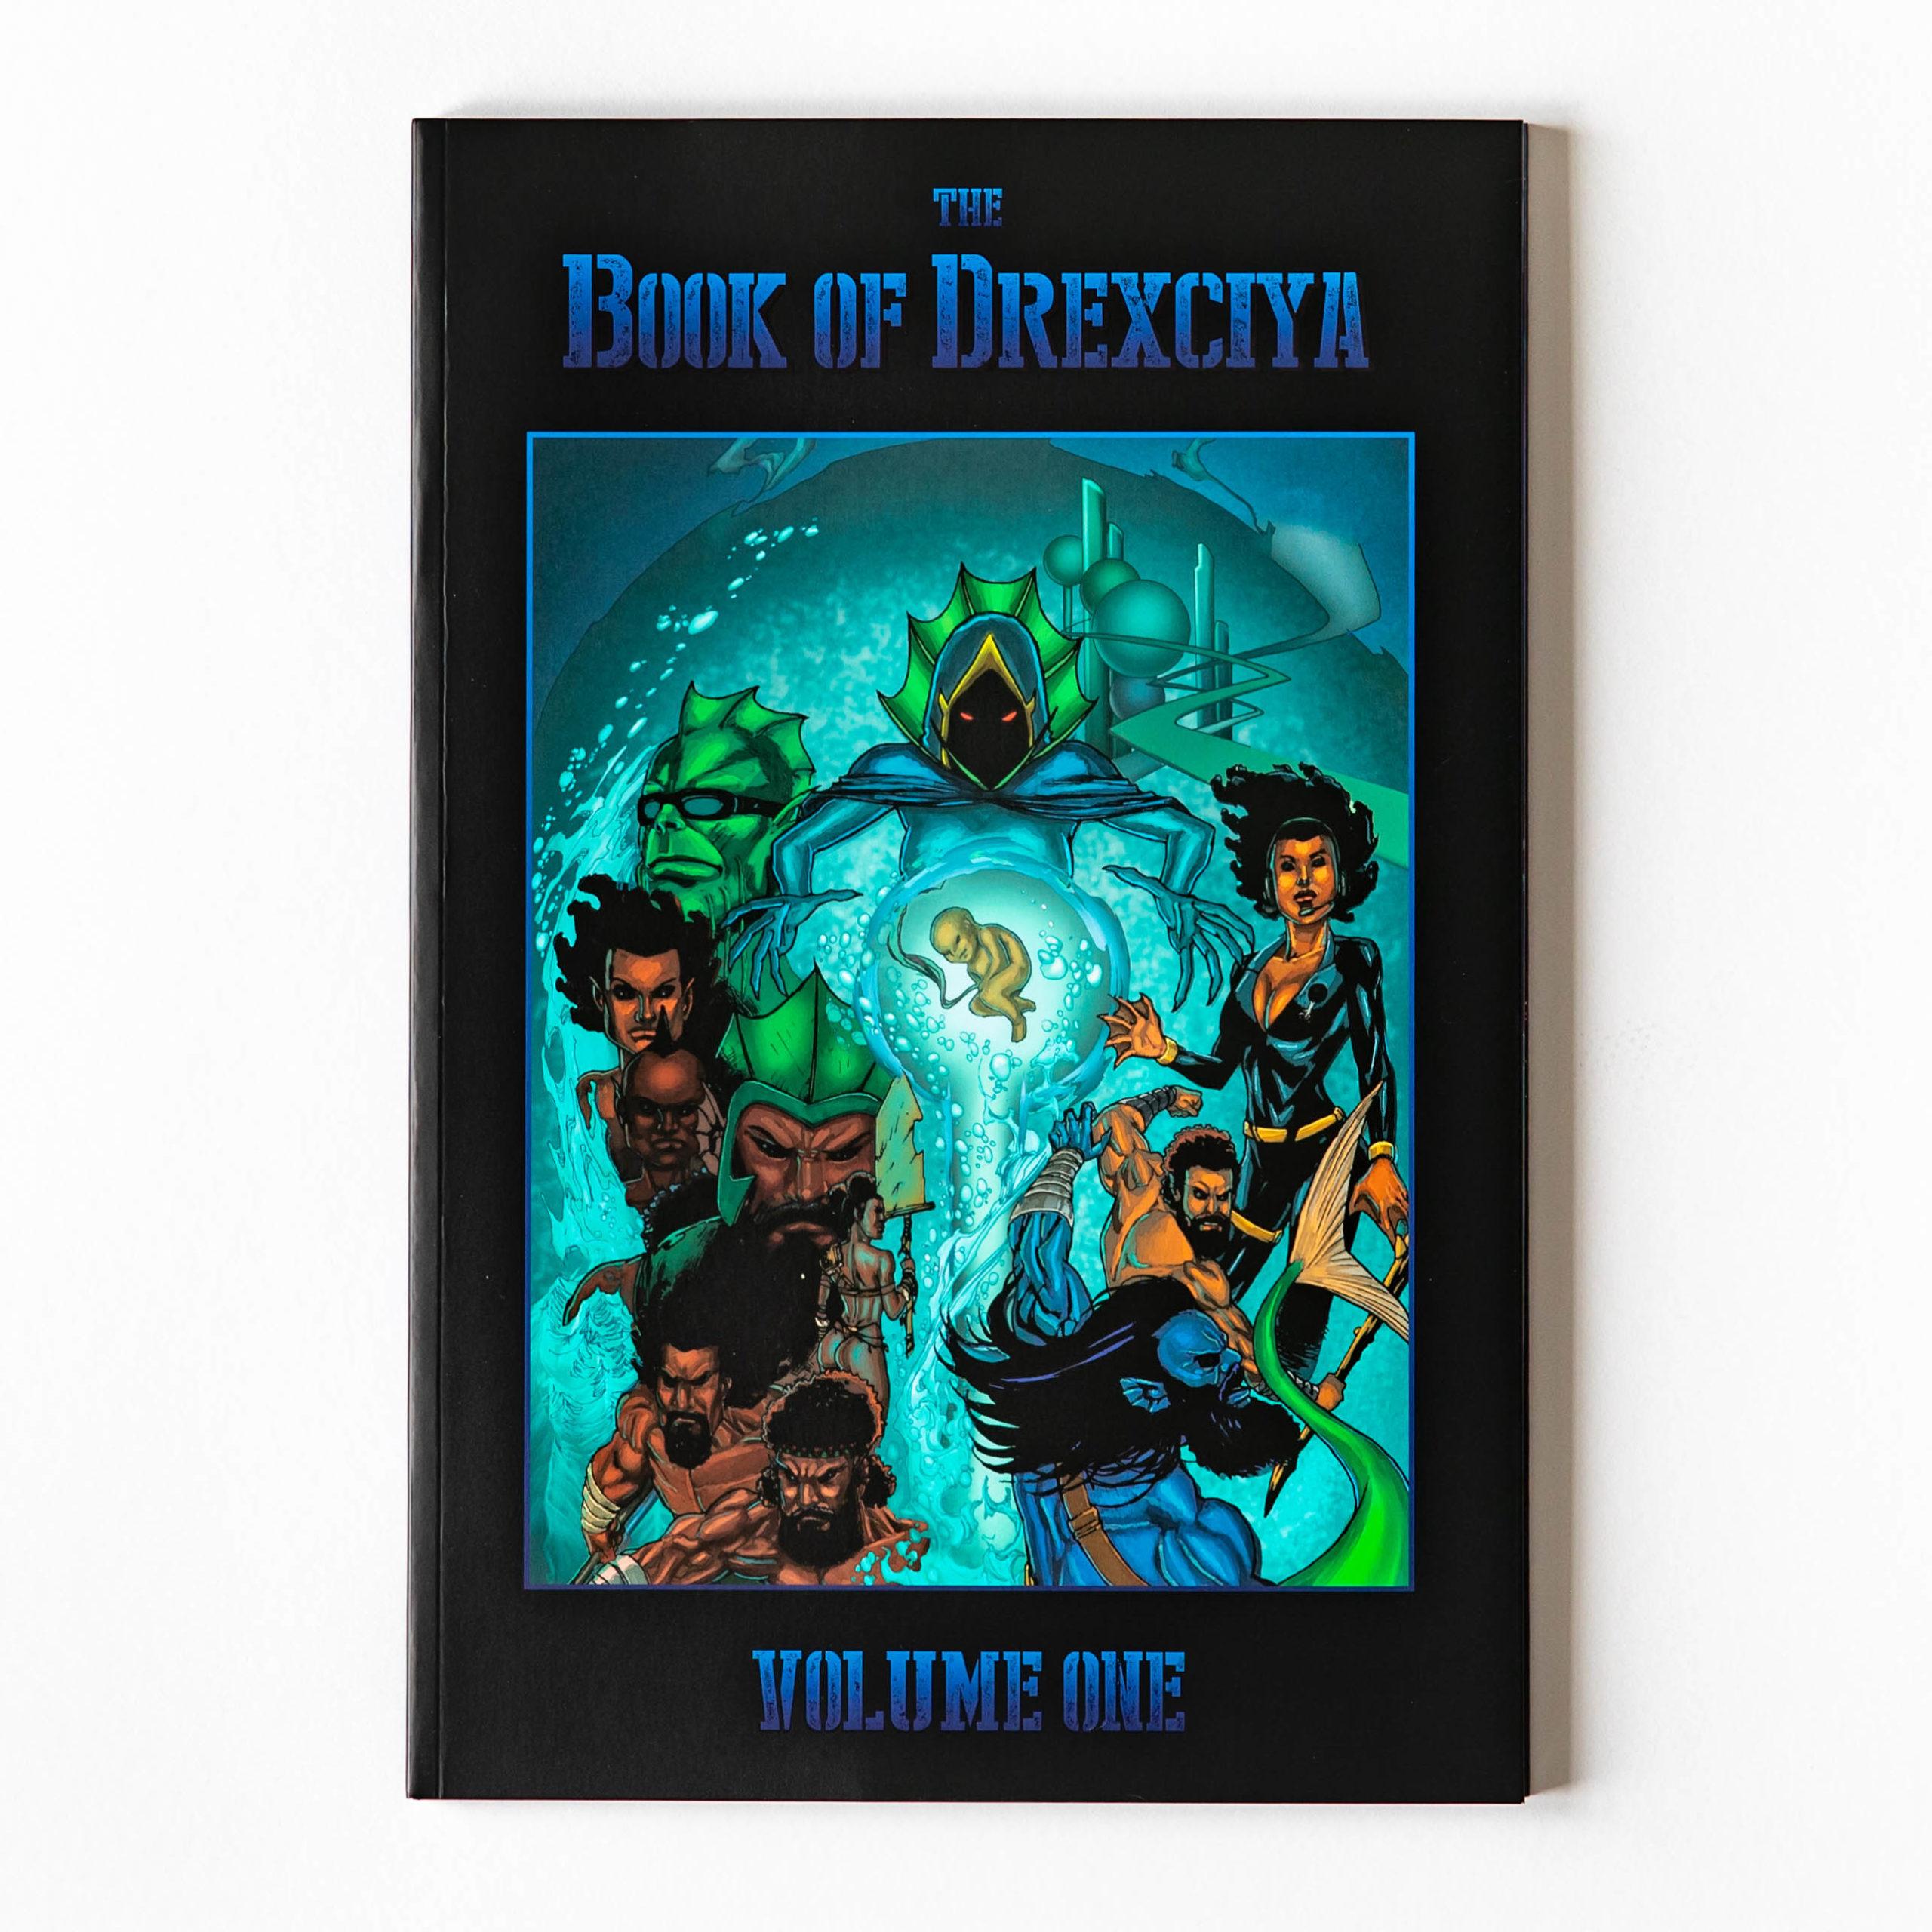 The Book of Drexciya Vol.1